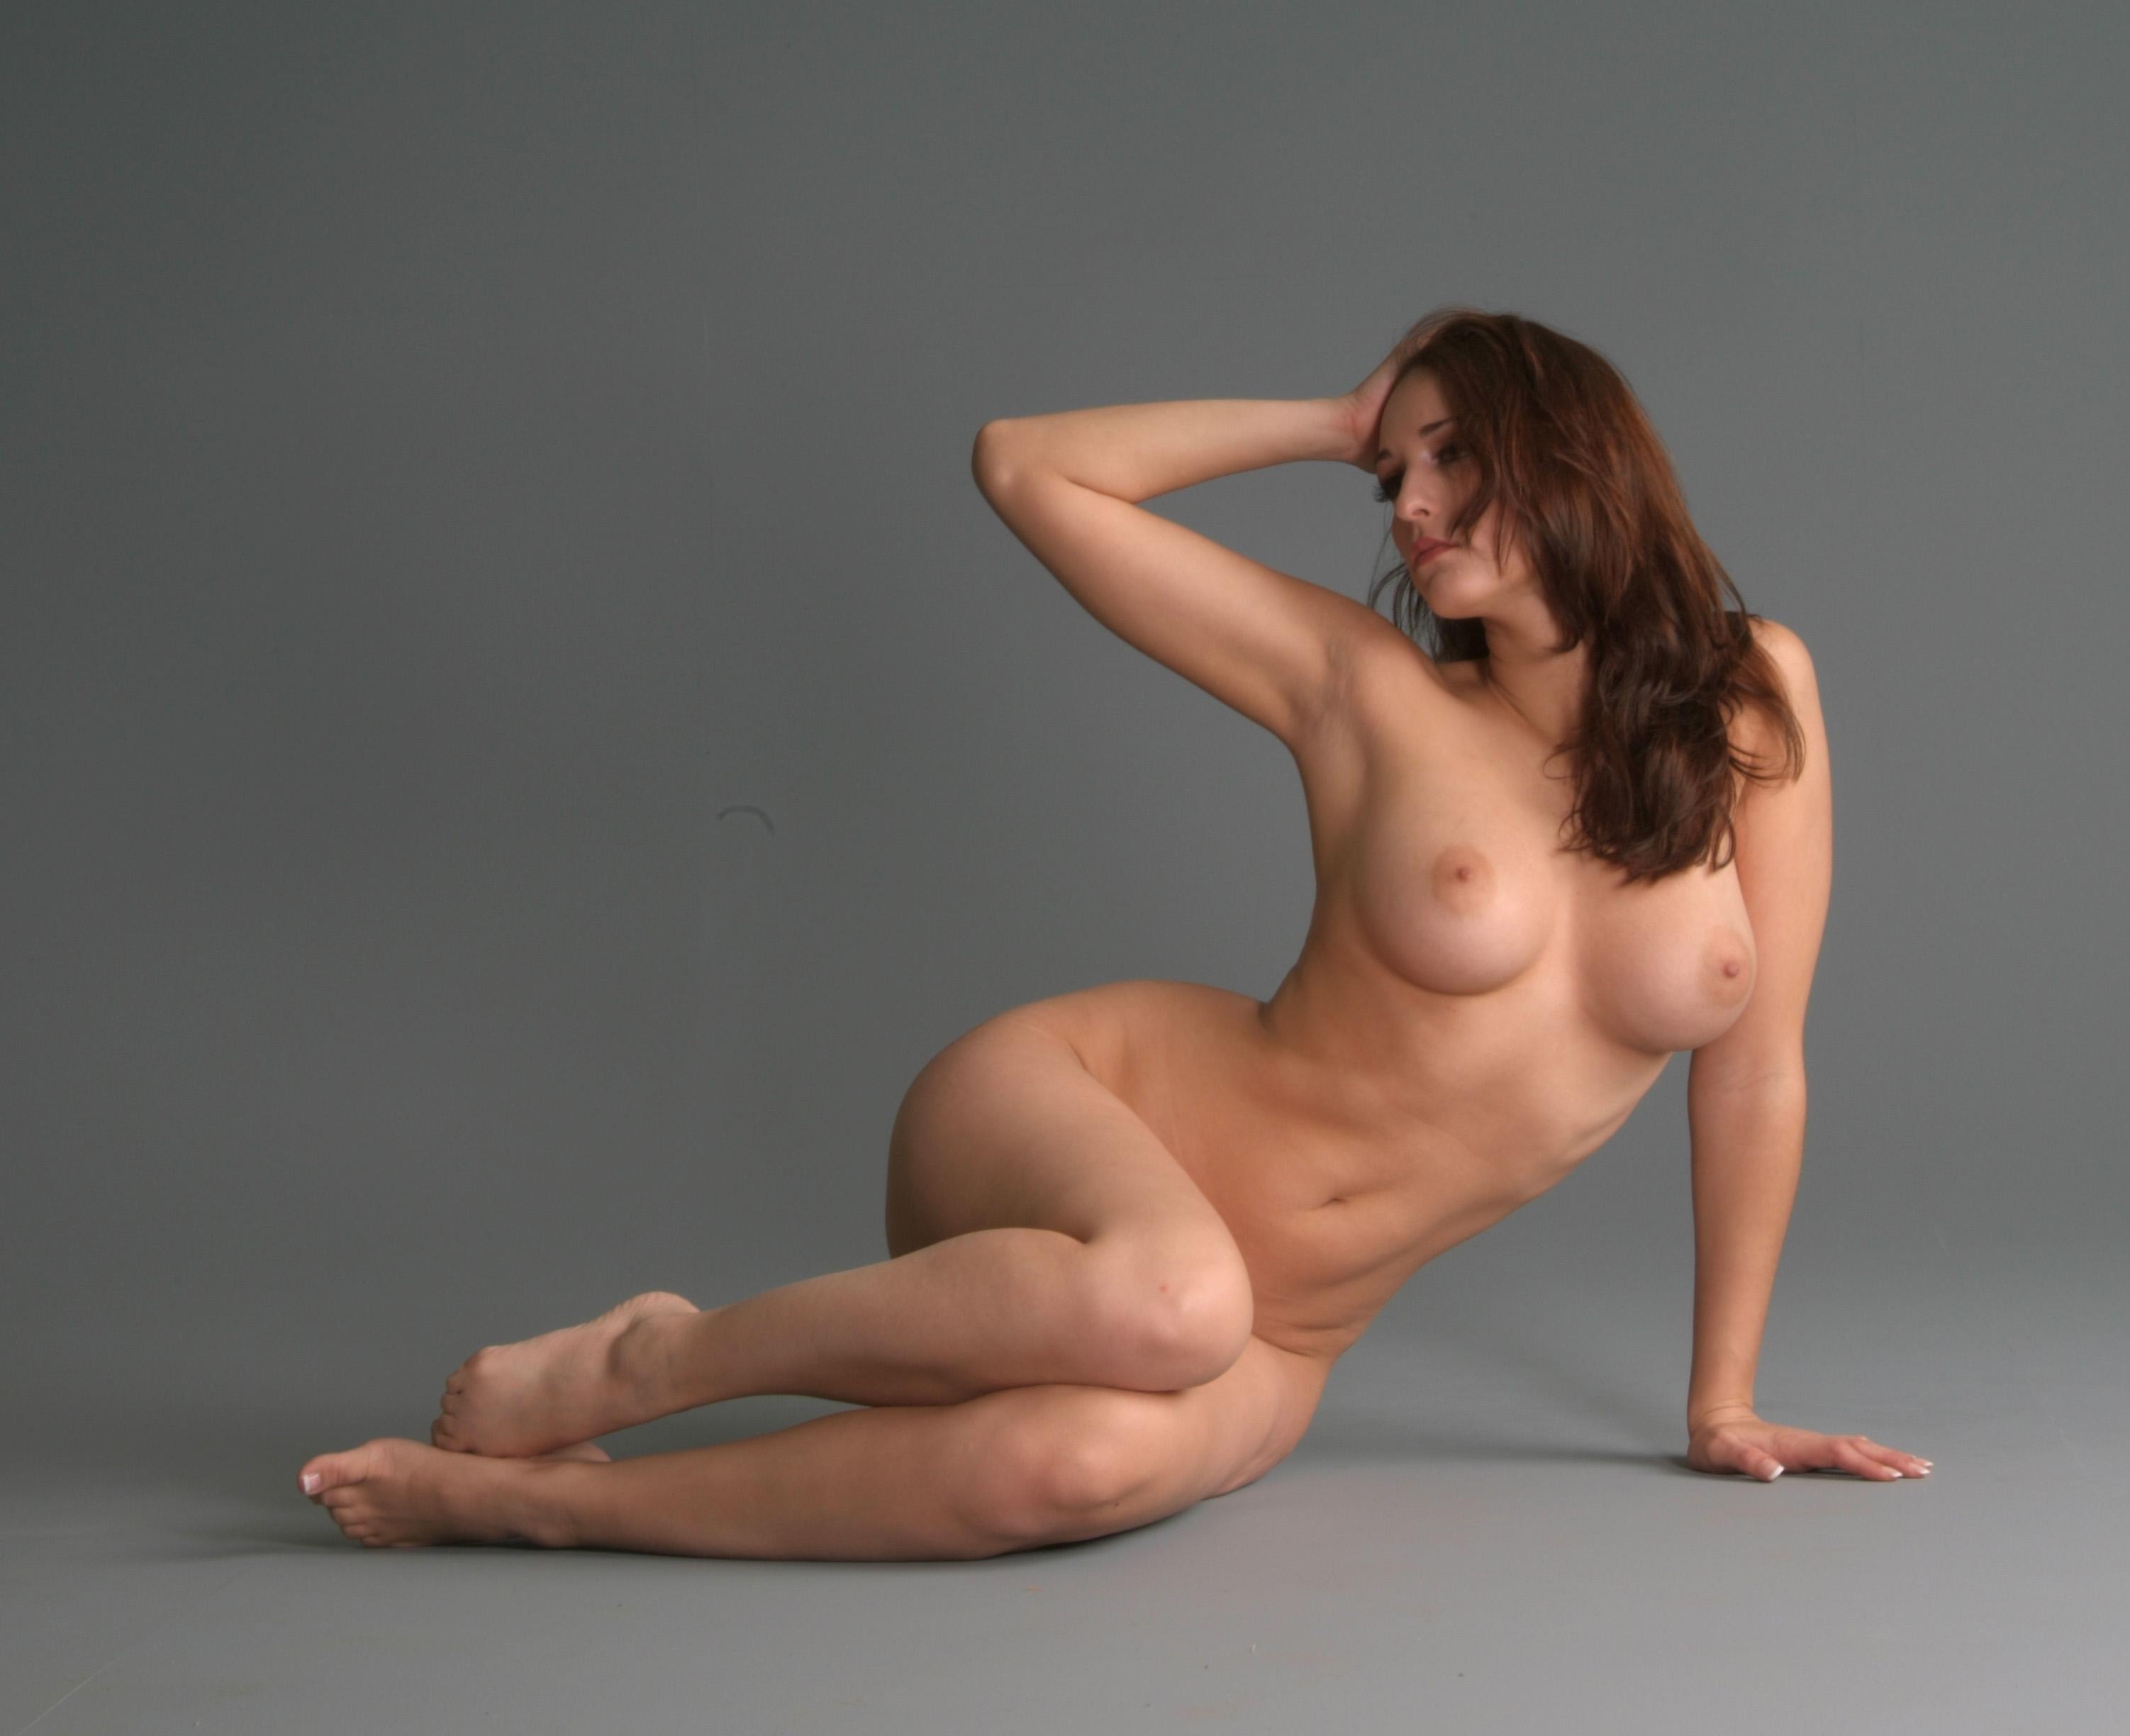 Nude models in sex pose porn model